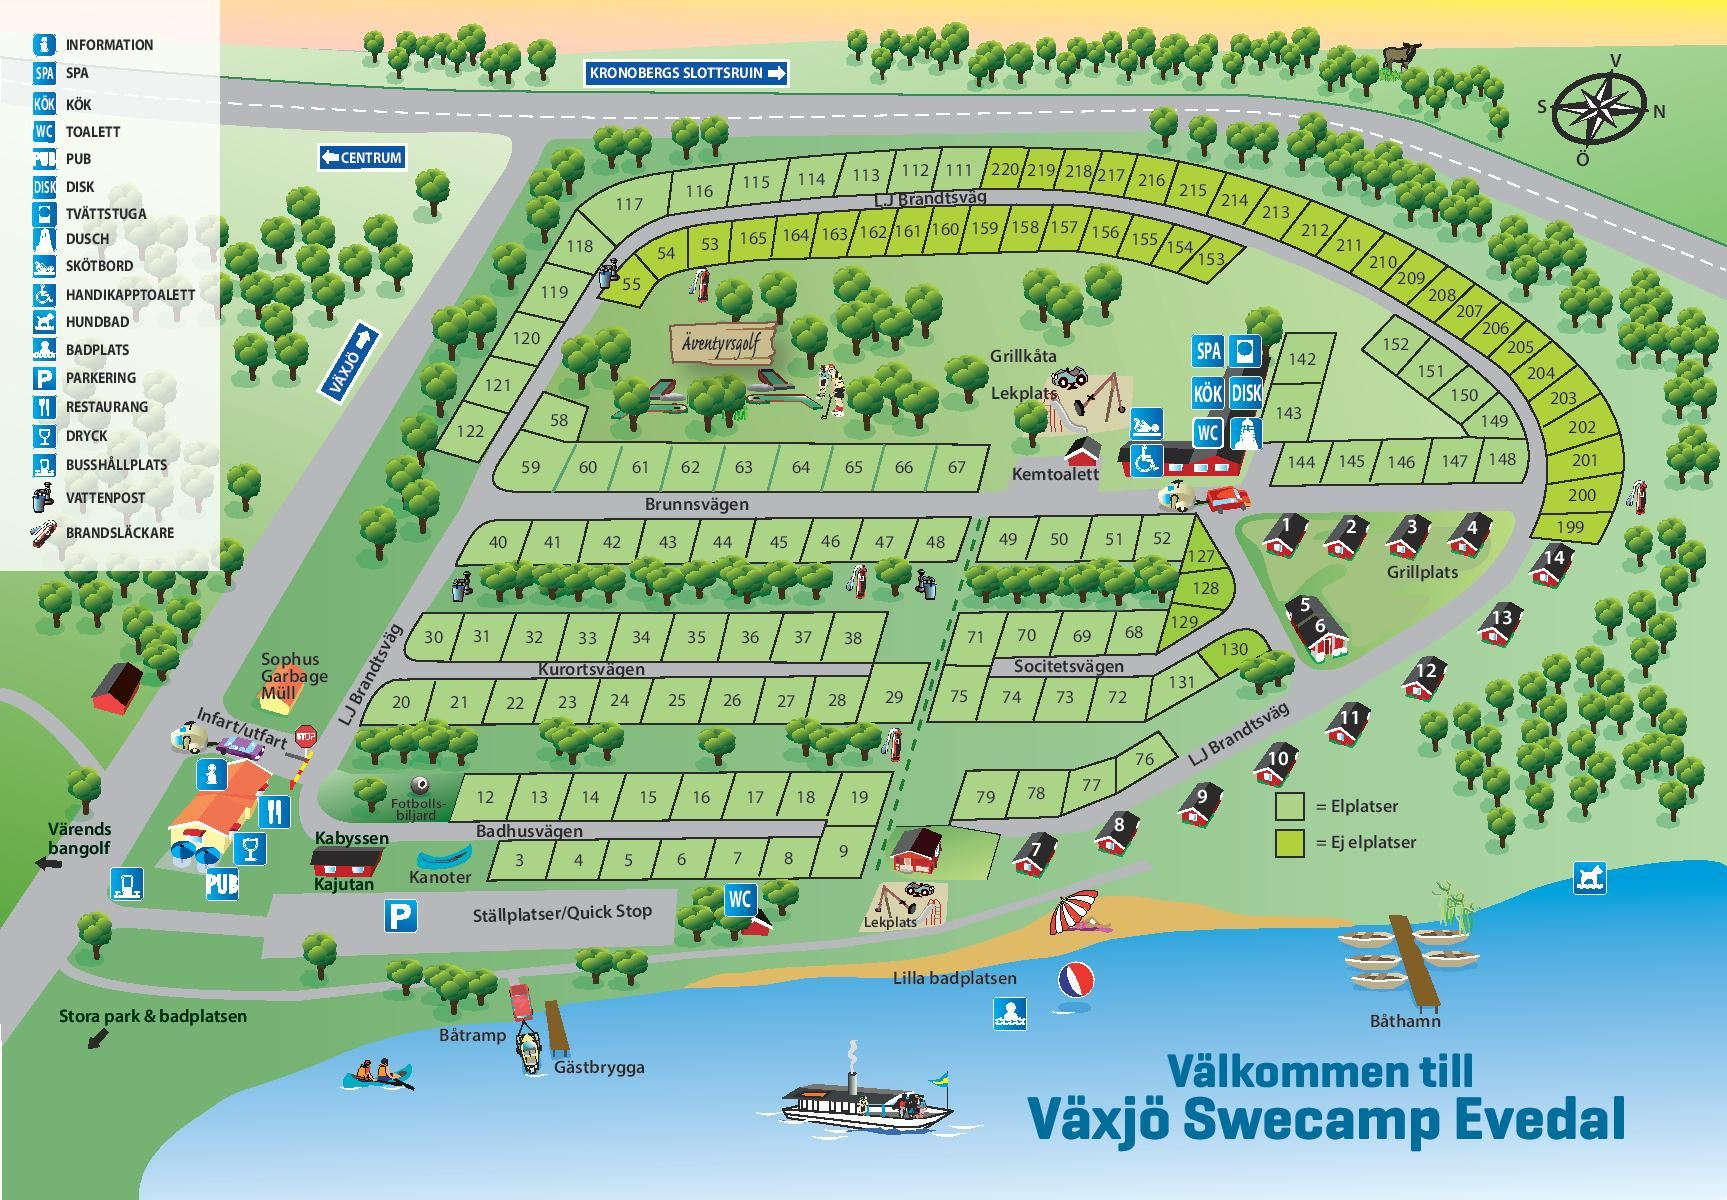 Växjö Swecamp Evedal/Camping